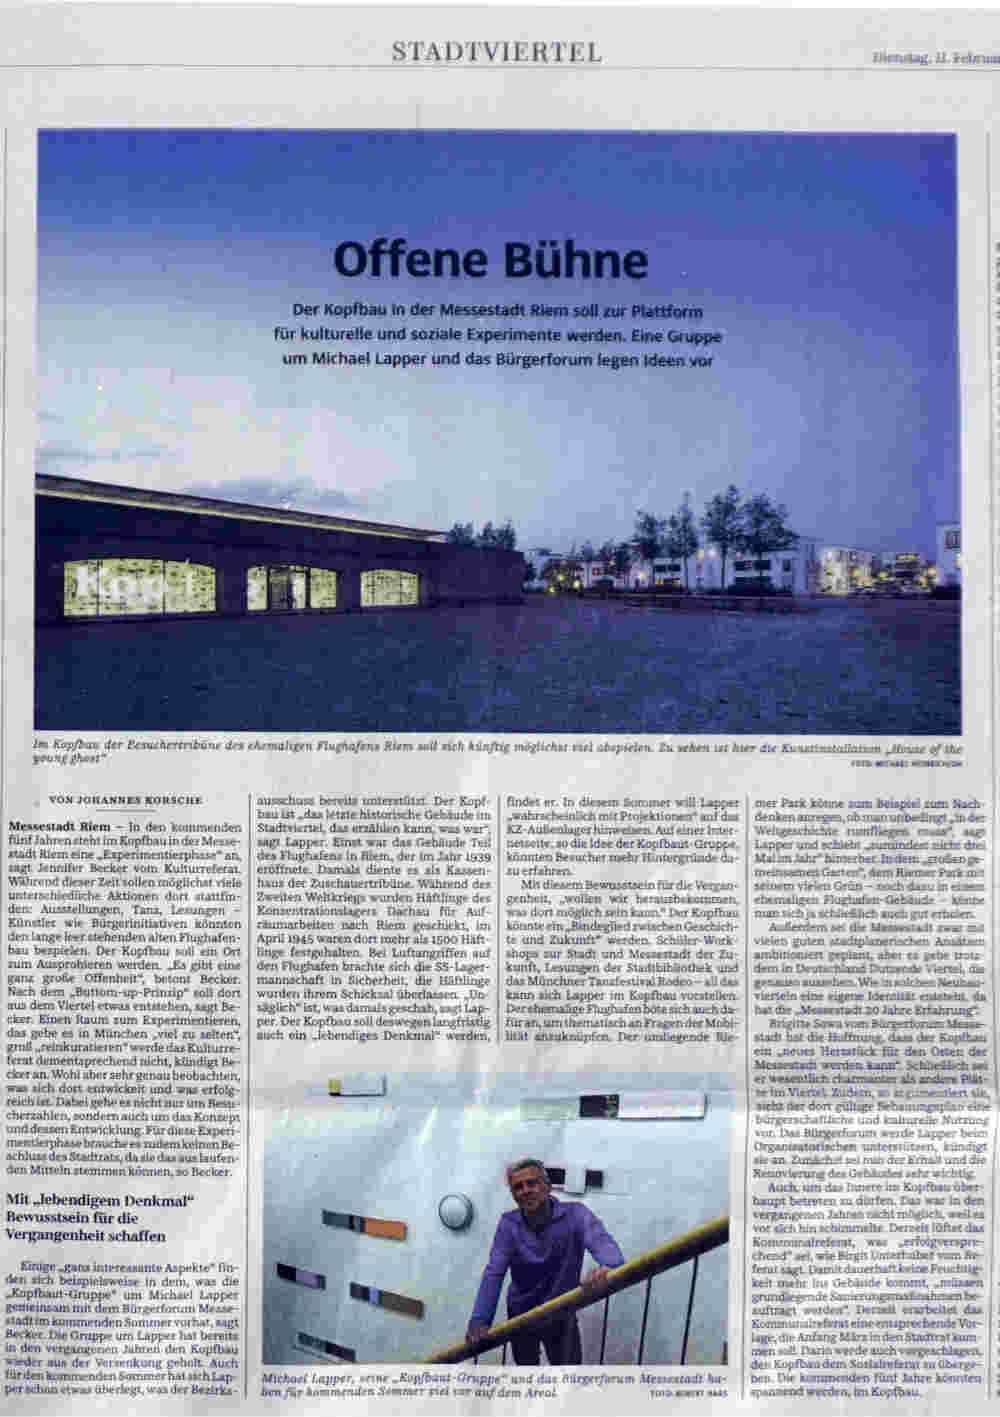 Offene Buehne SZ-Artikel